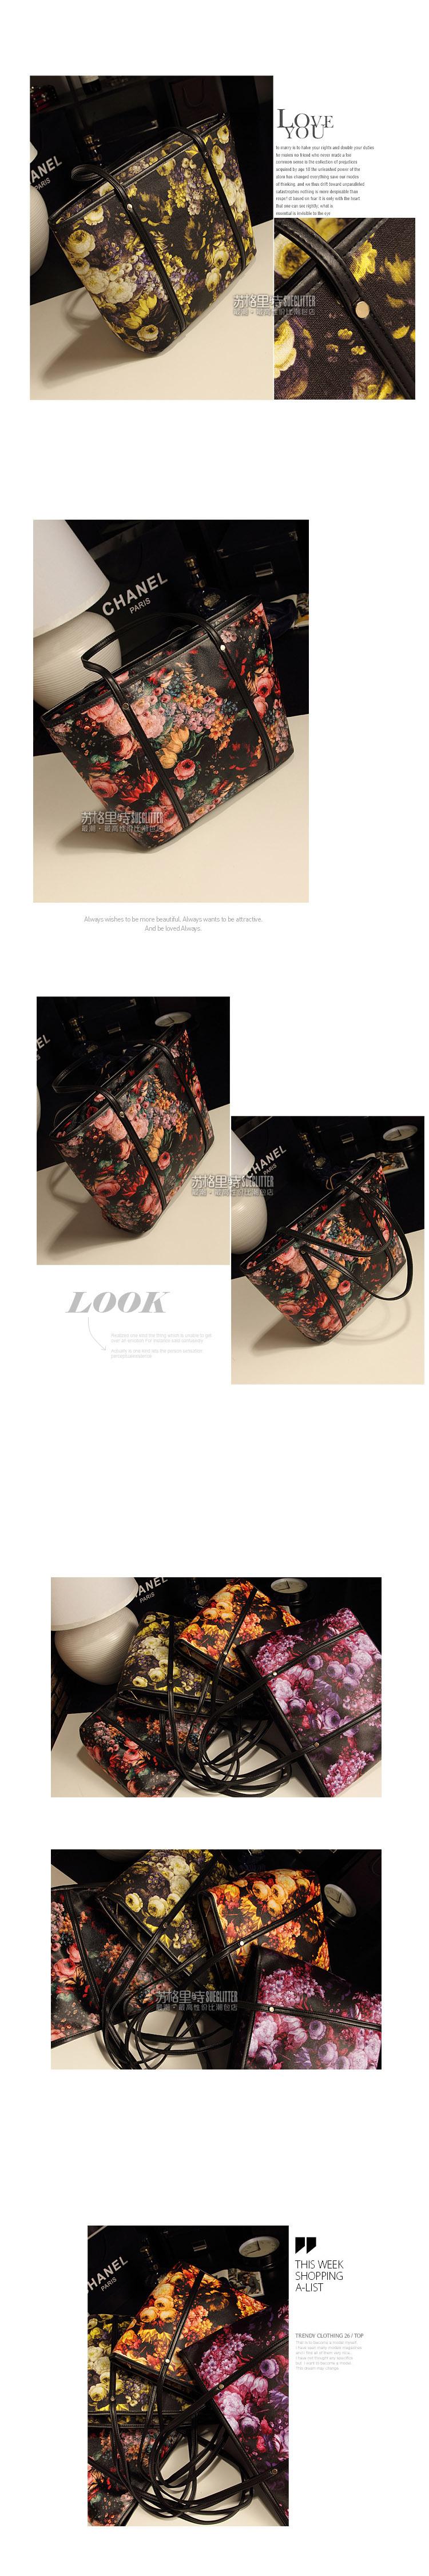 2018 new retro big bag Korean fashion ladies bag shoulder bag oil painting bag factory delivery 8